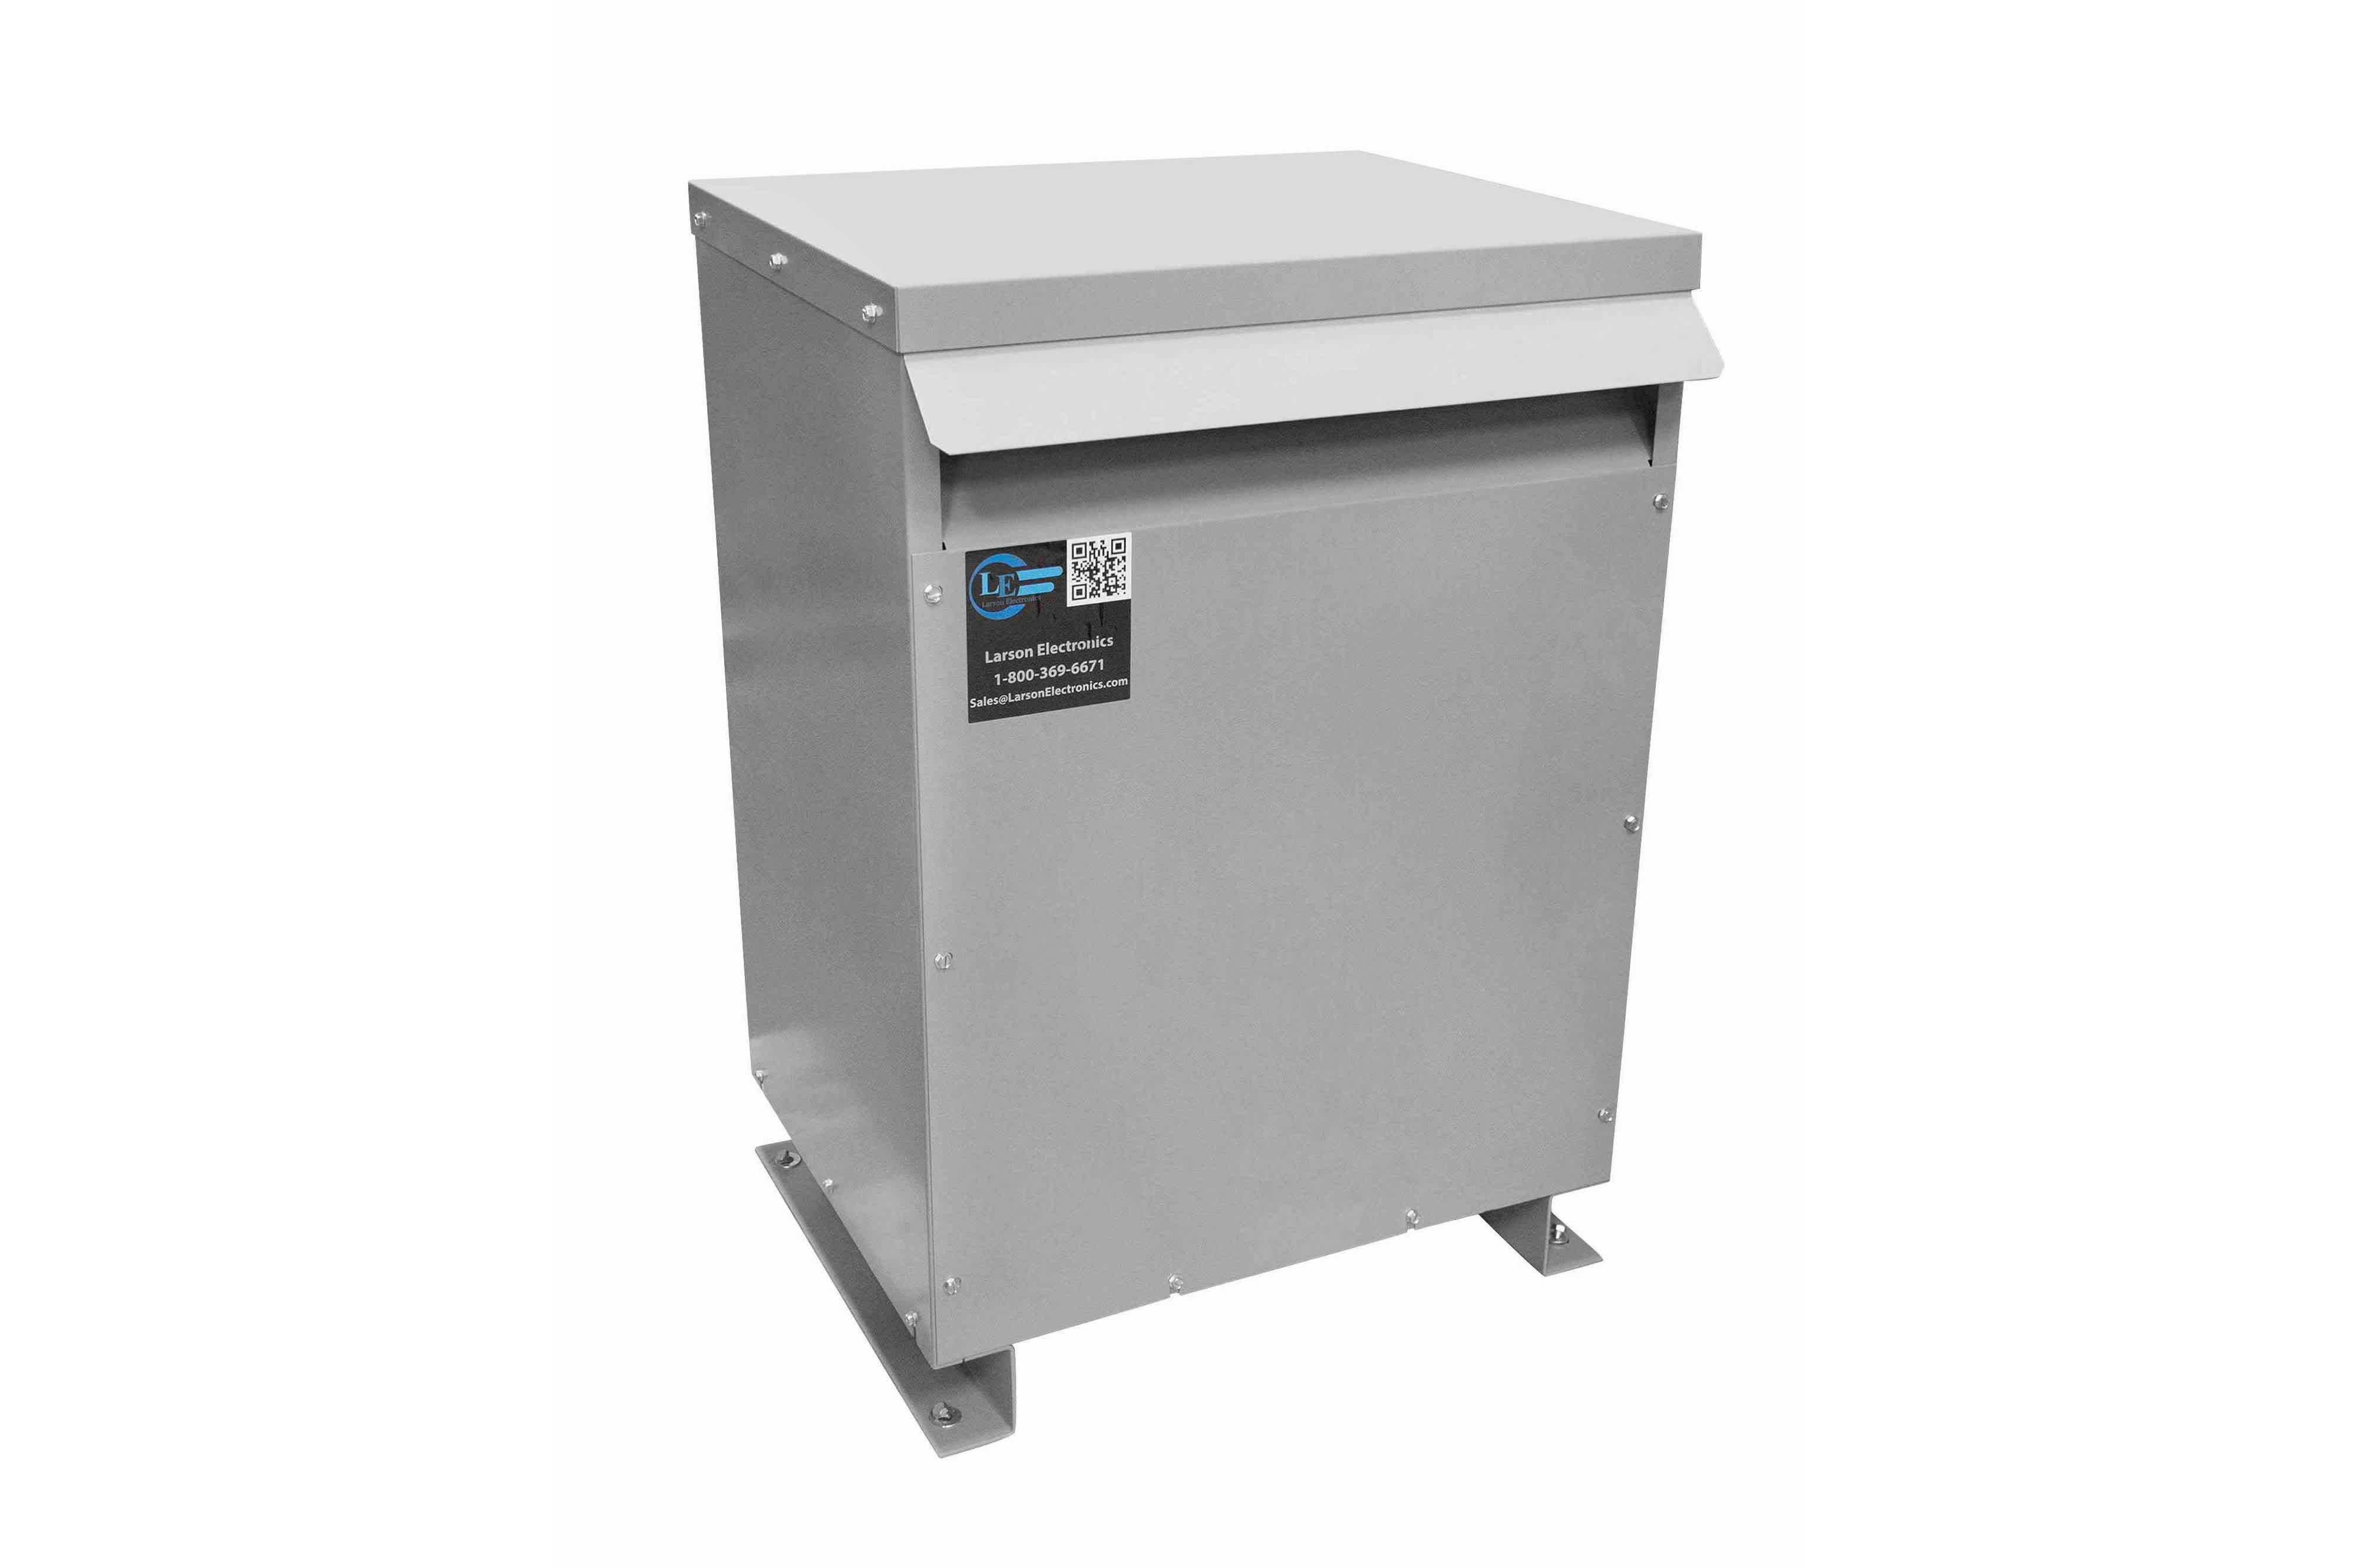 300 kVA 3PH Isolation Transformer, 575V Wye Primary, 208V Delta Secondary, N3R, Ventilated, 60 Hz